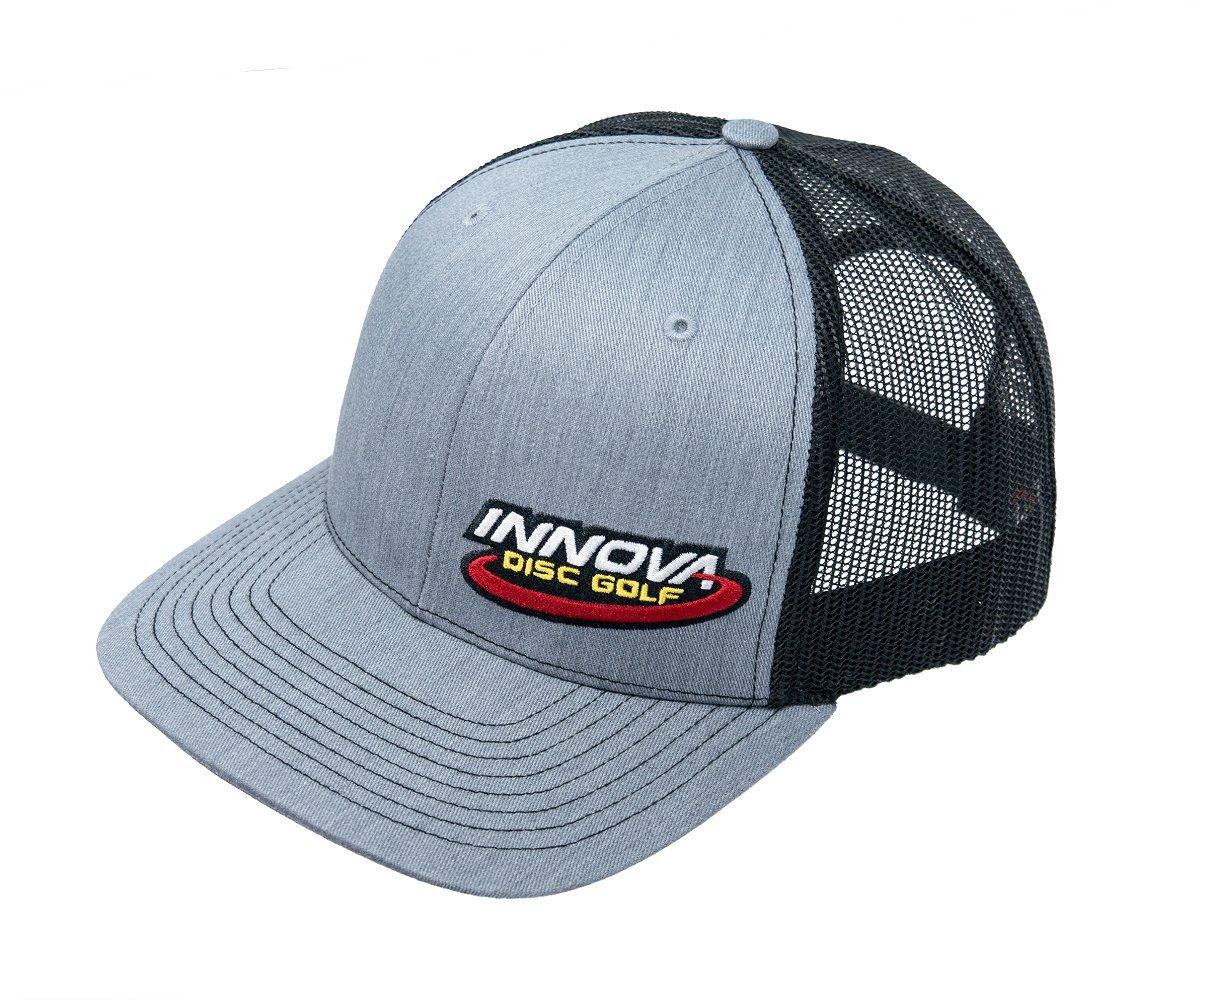 Innova Disc GolfロゴスナップバックTruckerメッシュディスクゴルフ帽子 B07DF54F72 Gray w/ Black Gray w/ Black